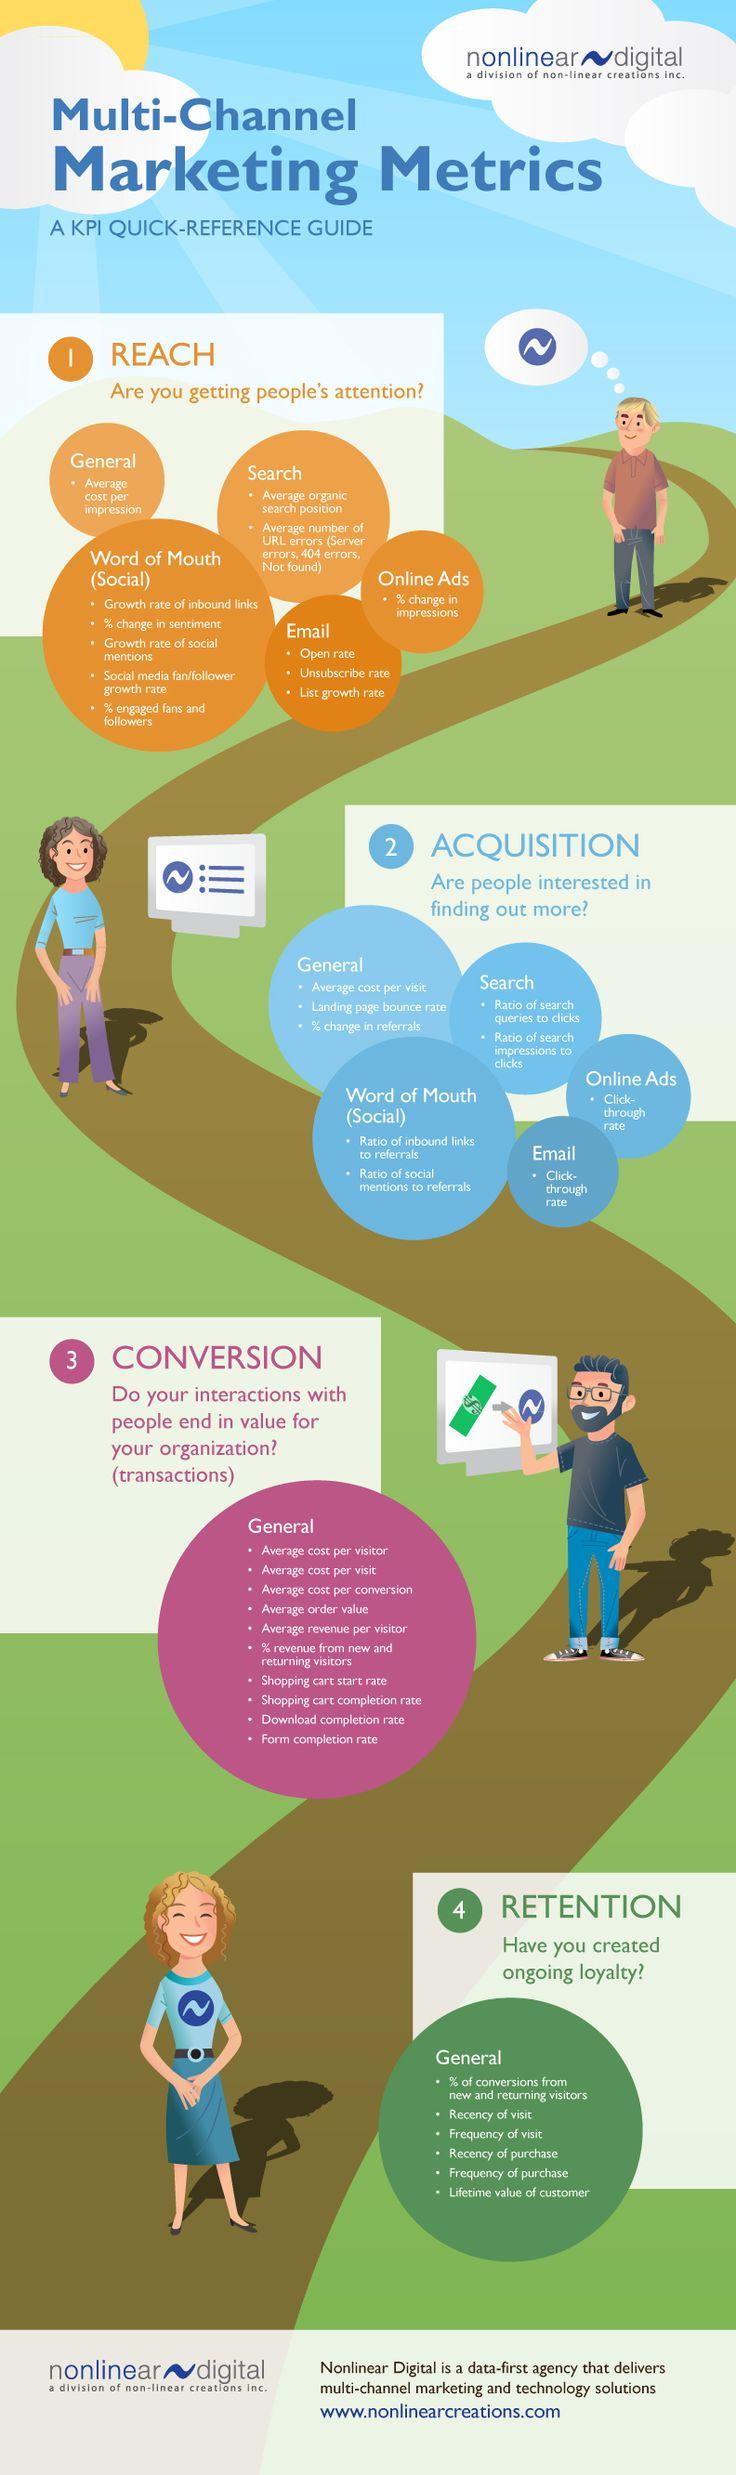 Métricas para marketing multi canal #infografia #infographic #marketing